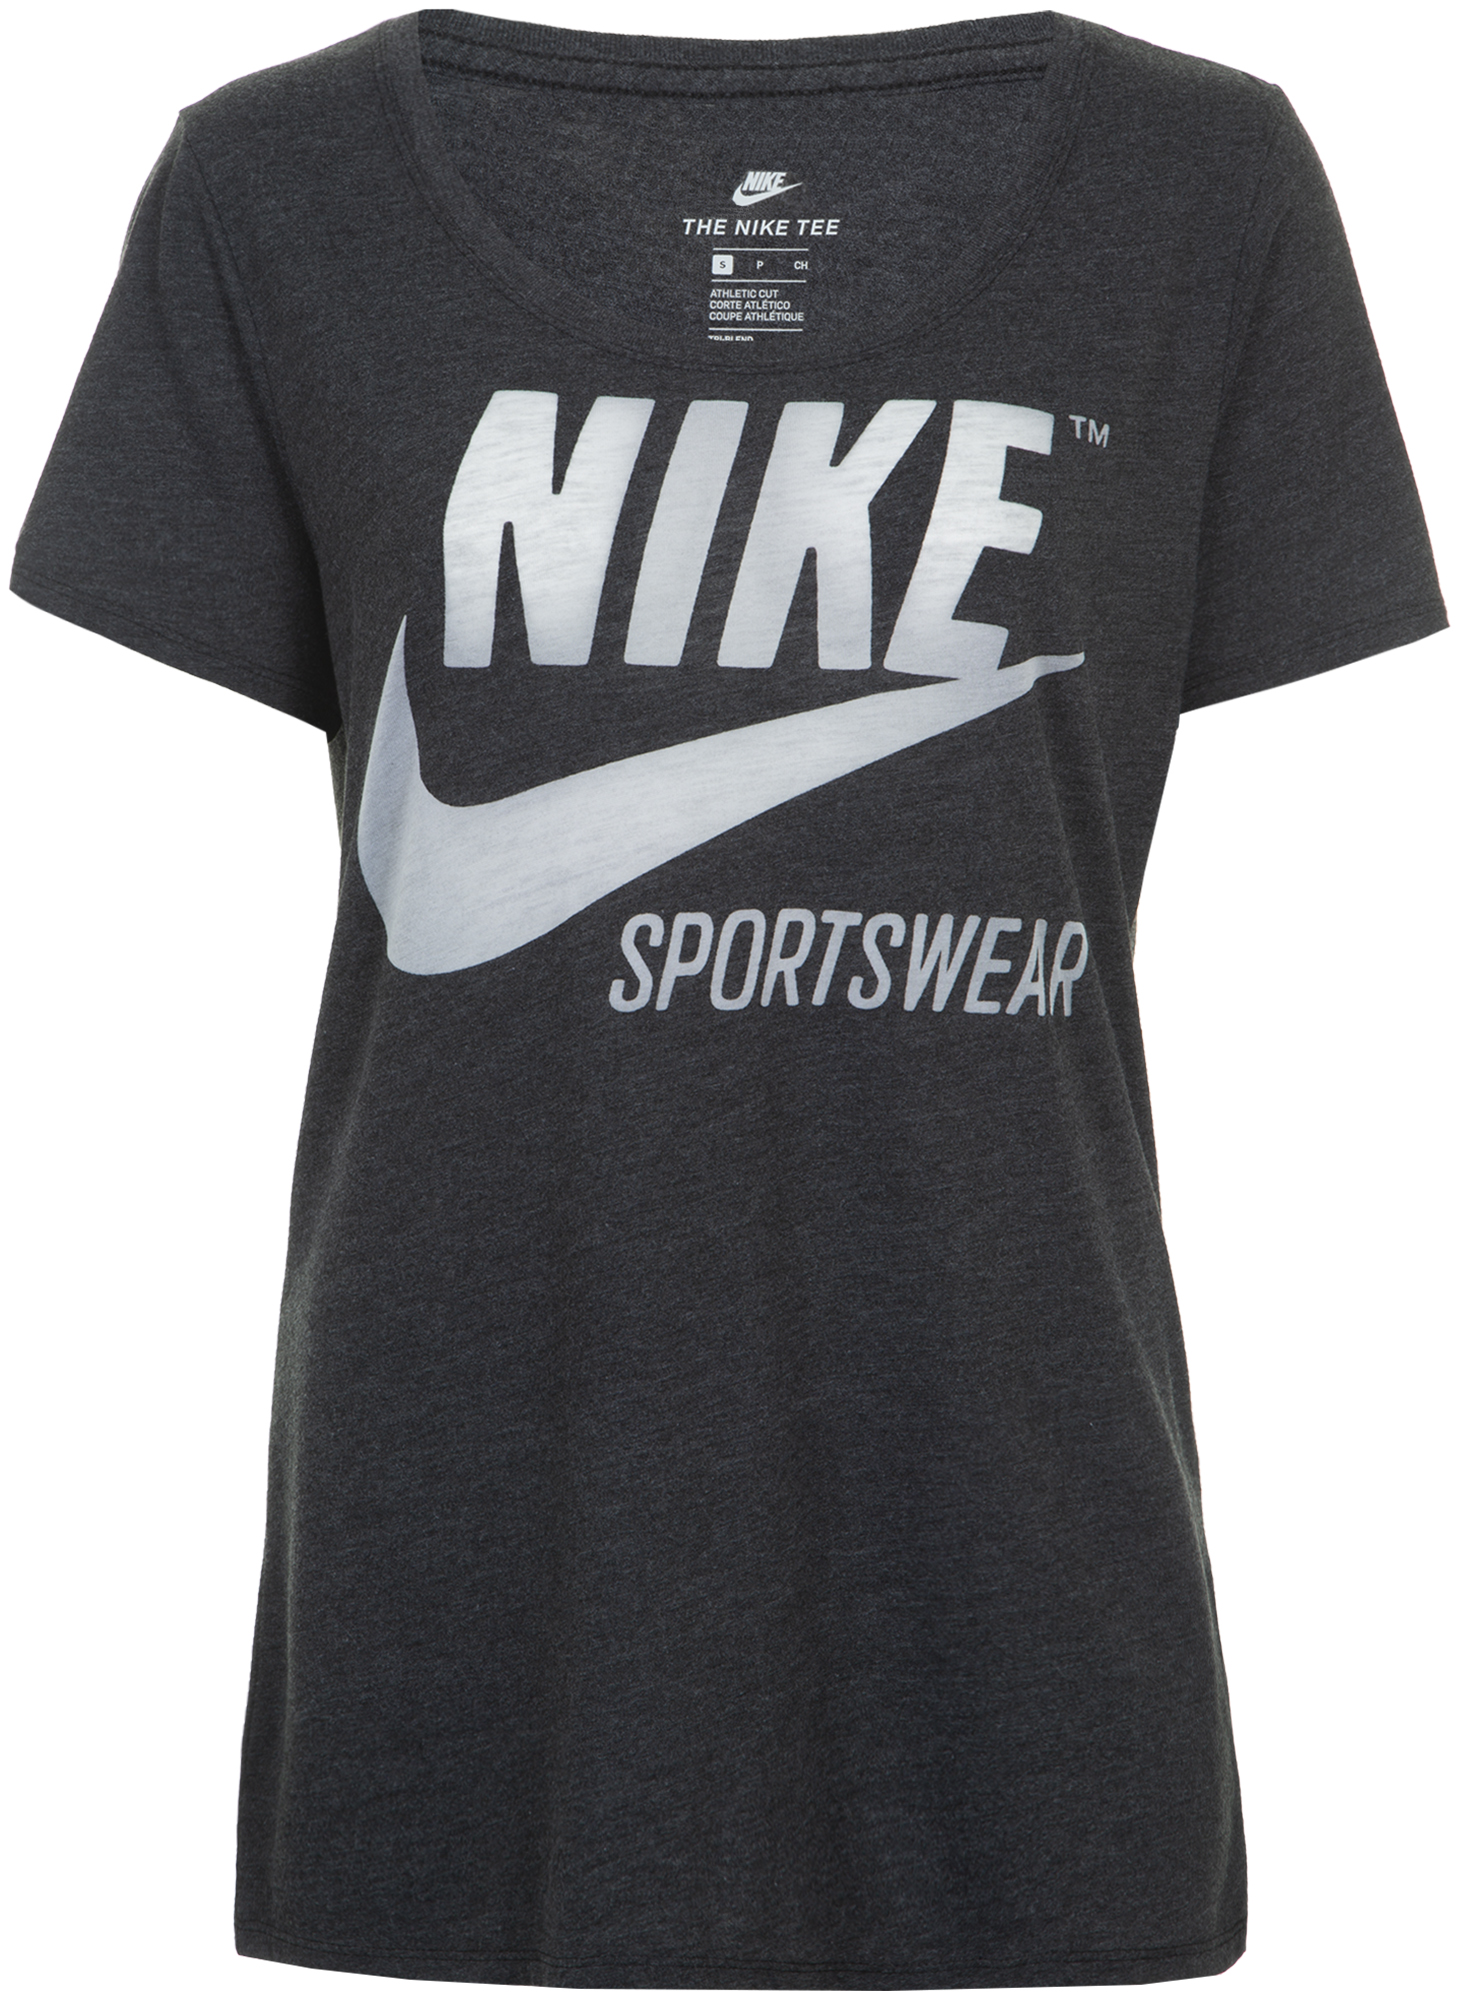 Nike Футболка женская Nike Sportswear, размер 50-52 футболка женская nike pro top цвет белый 889540 100 размер s 42 44